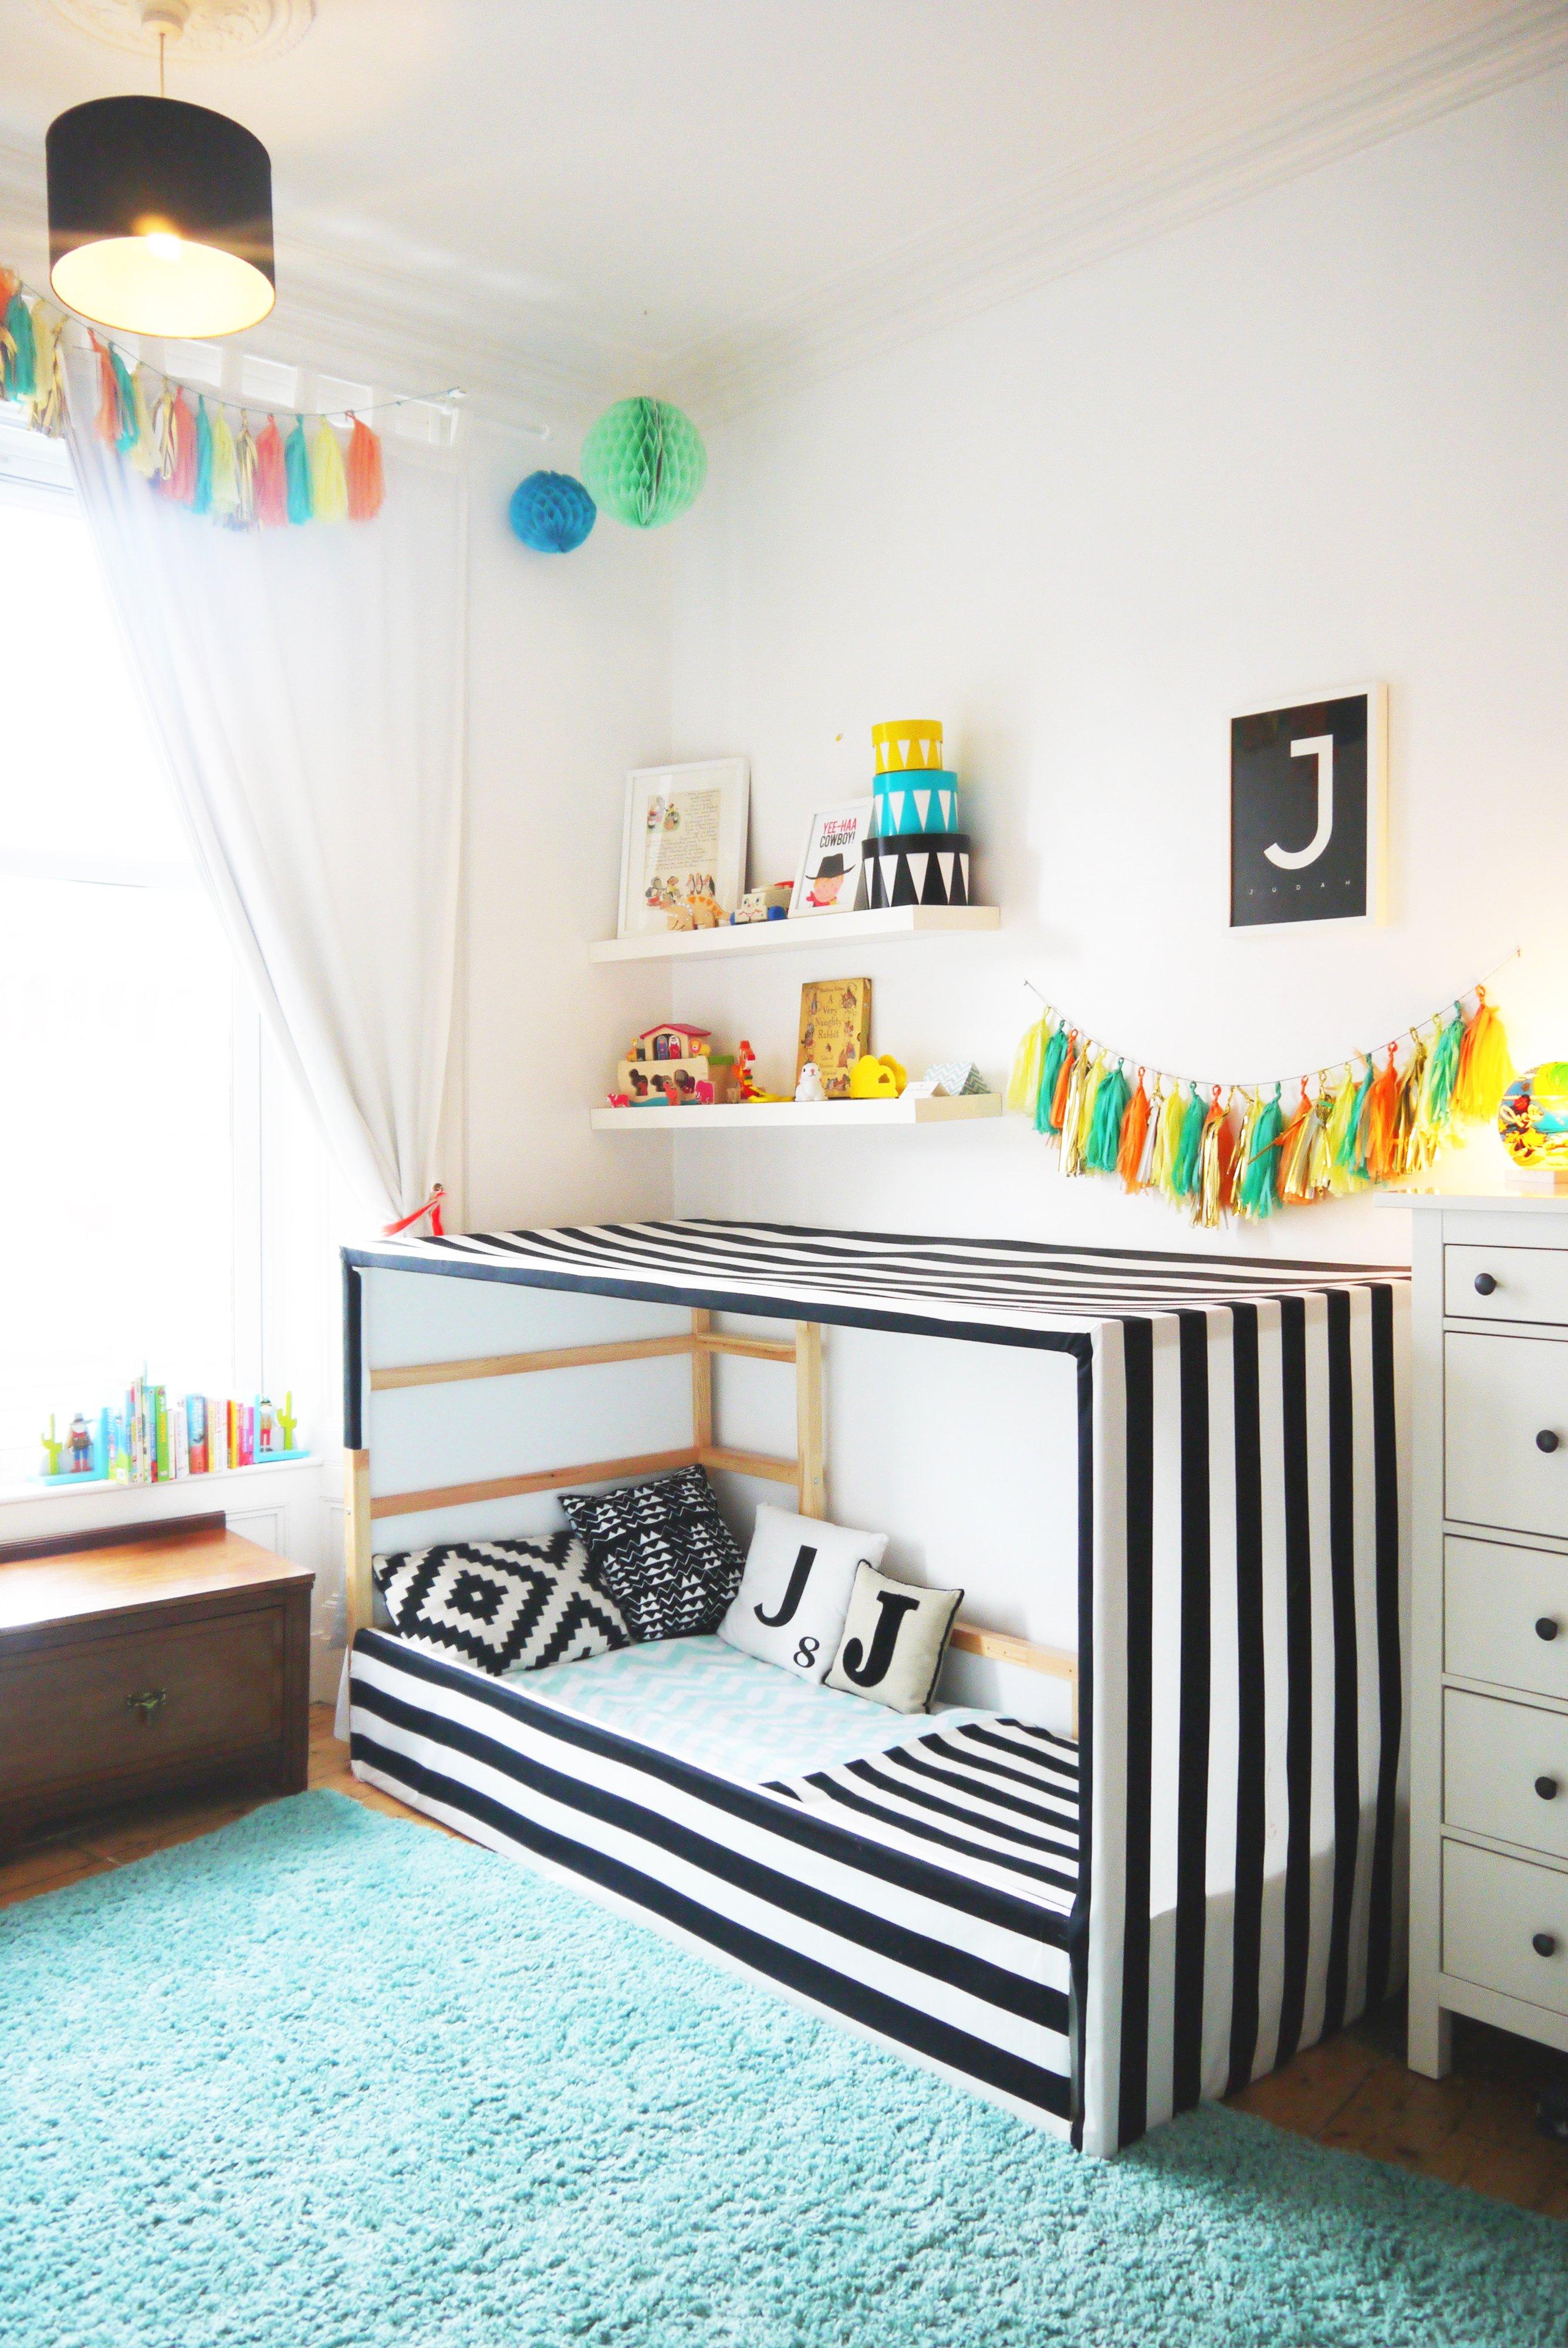 Ideas for Hacking, Tweaking & Customizing the IKEA Kura Bed